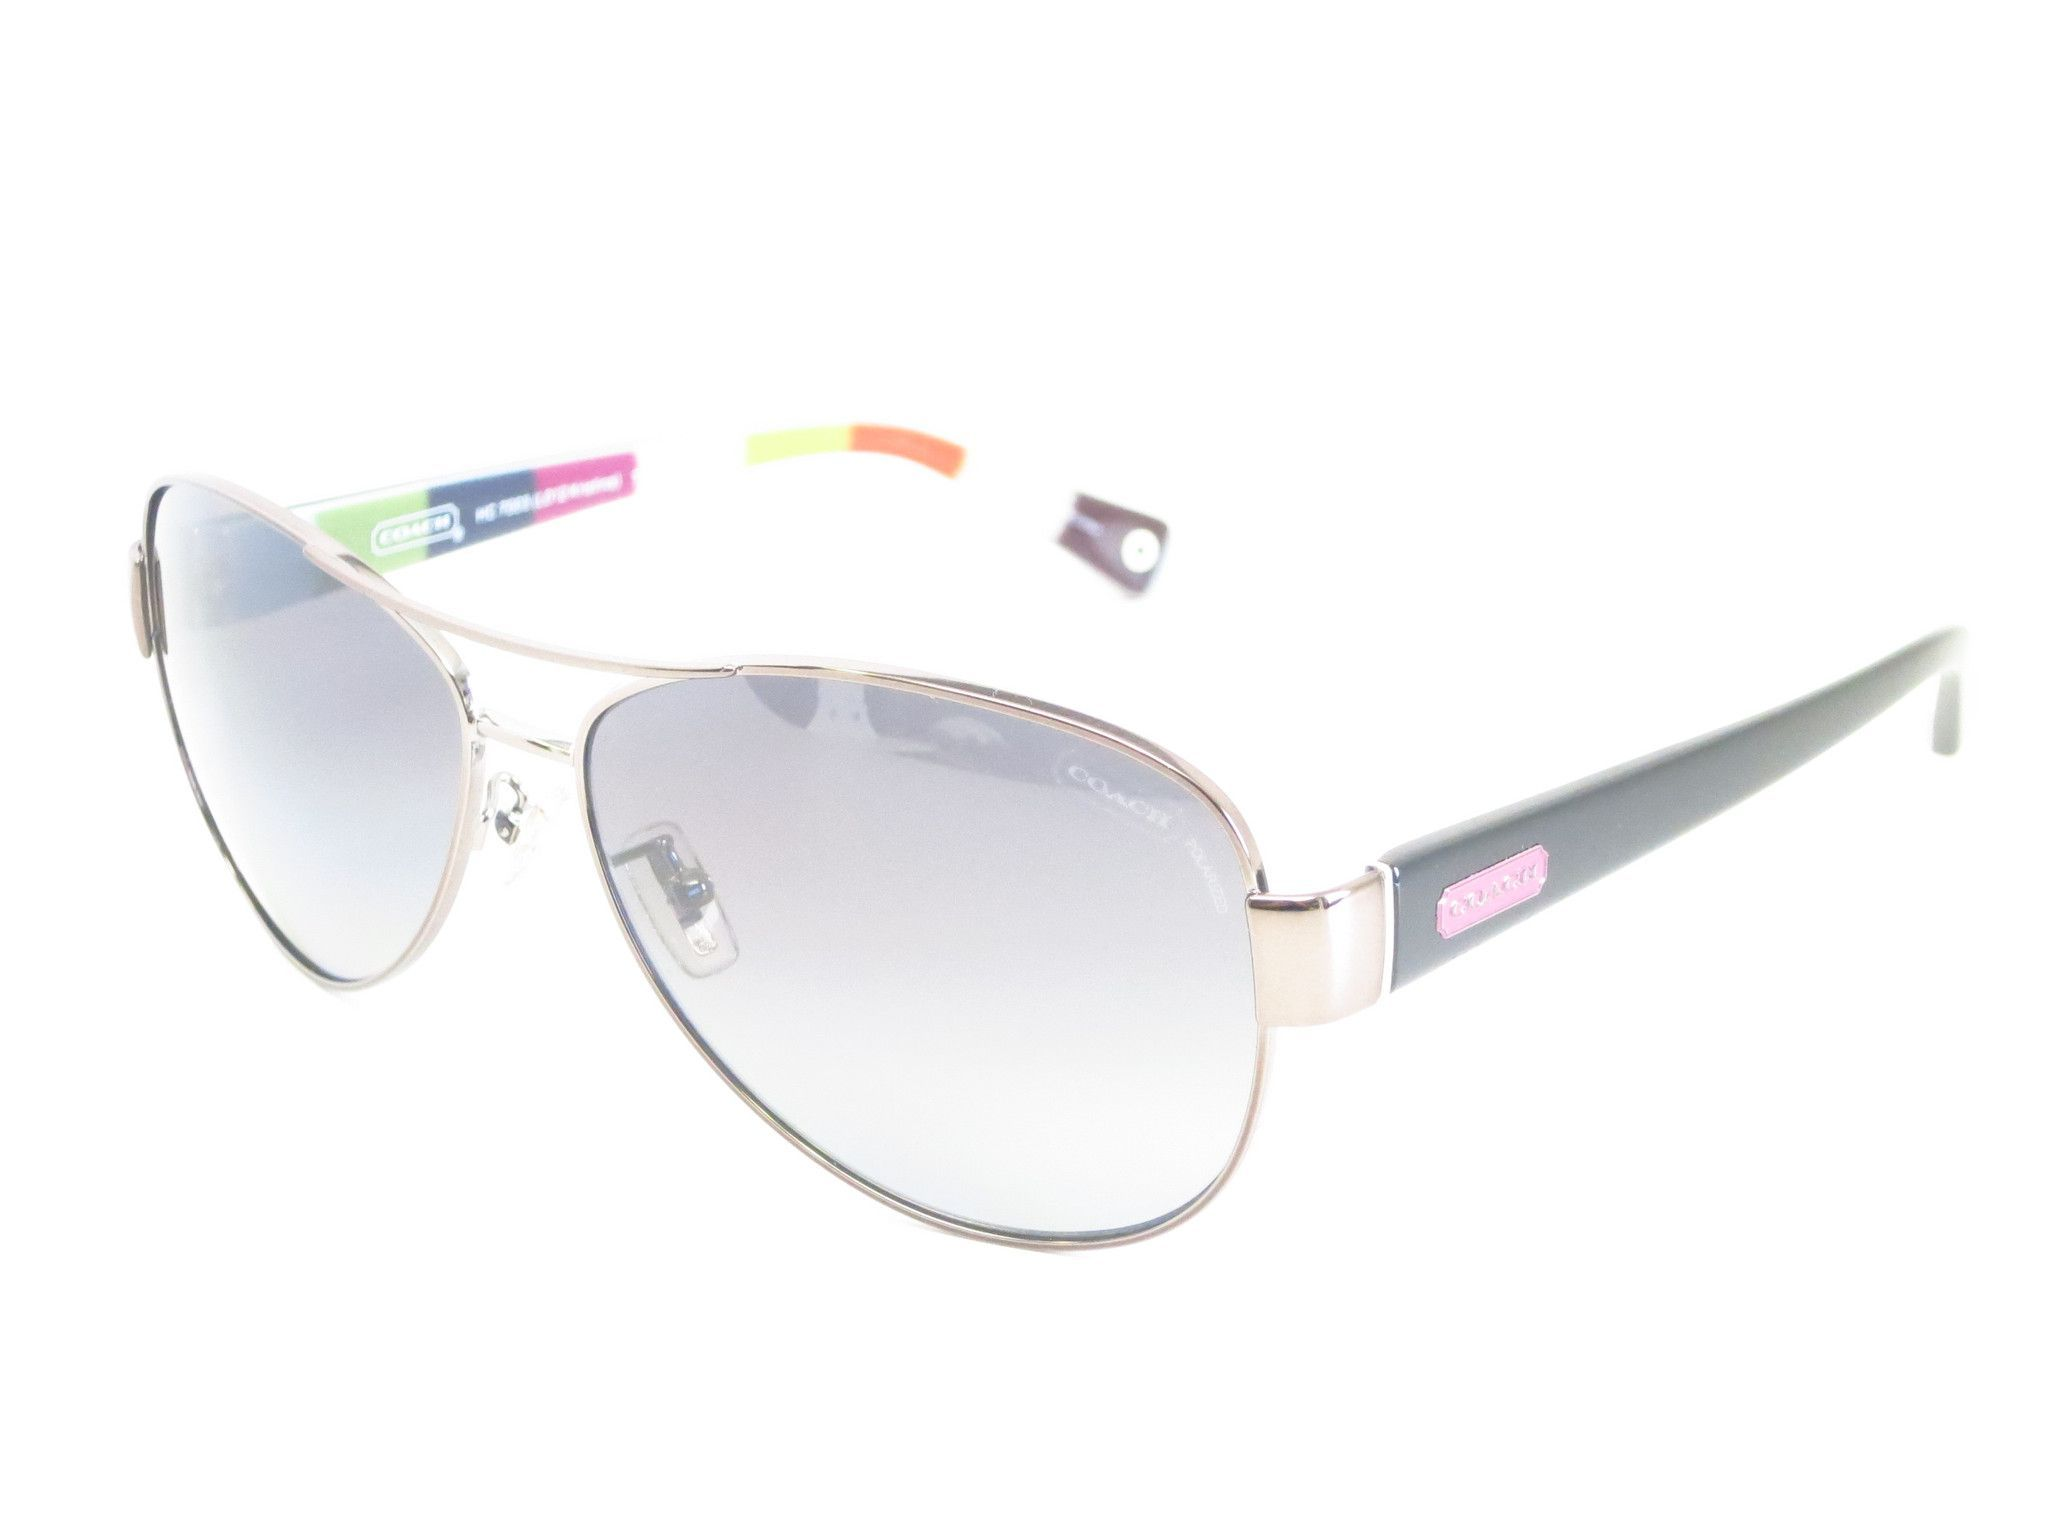 82679c95c7852 ... best price coach hc 7003 kristina 9010 t3 dark silver pink polarized  sunglasses 11e1c e9585